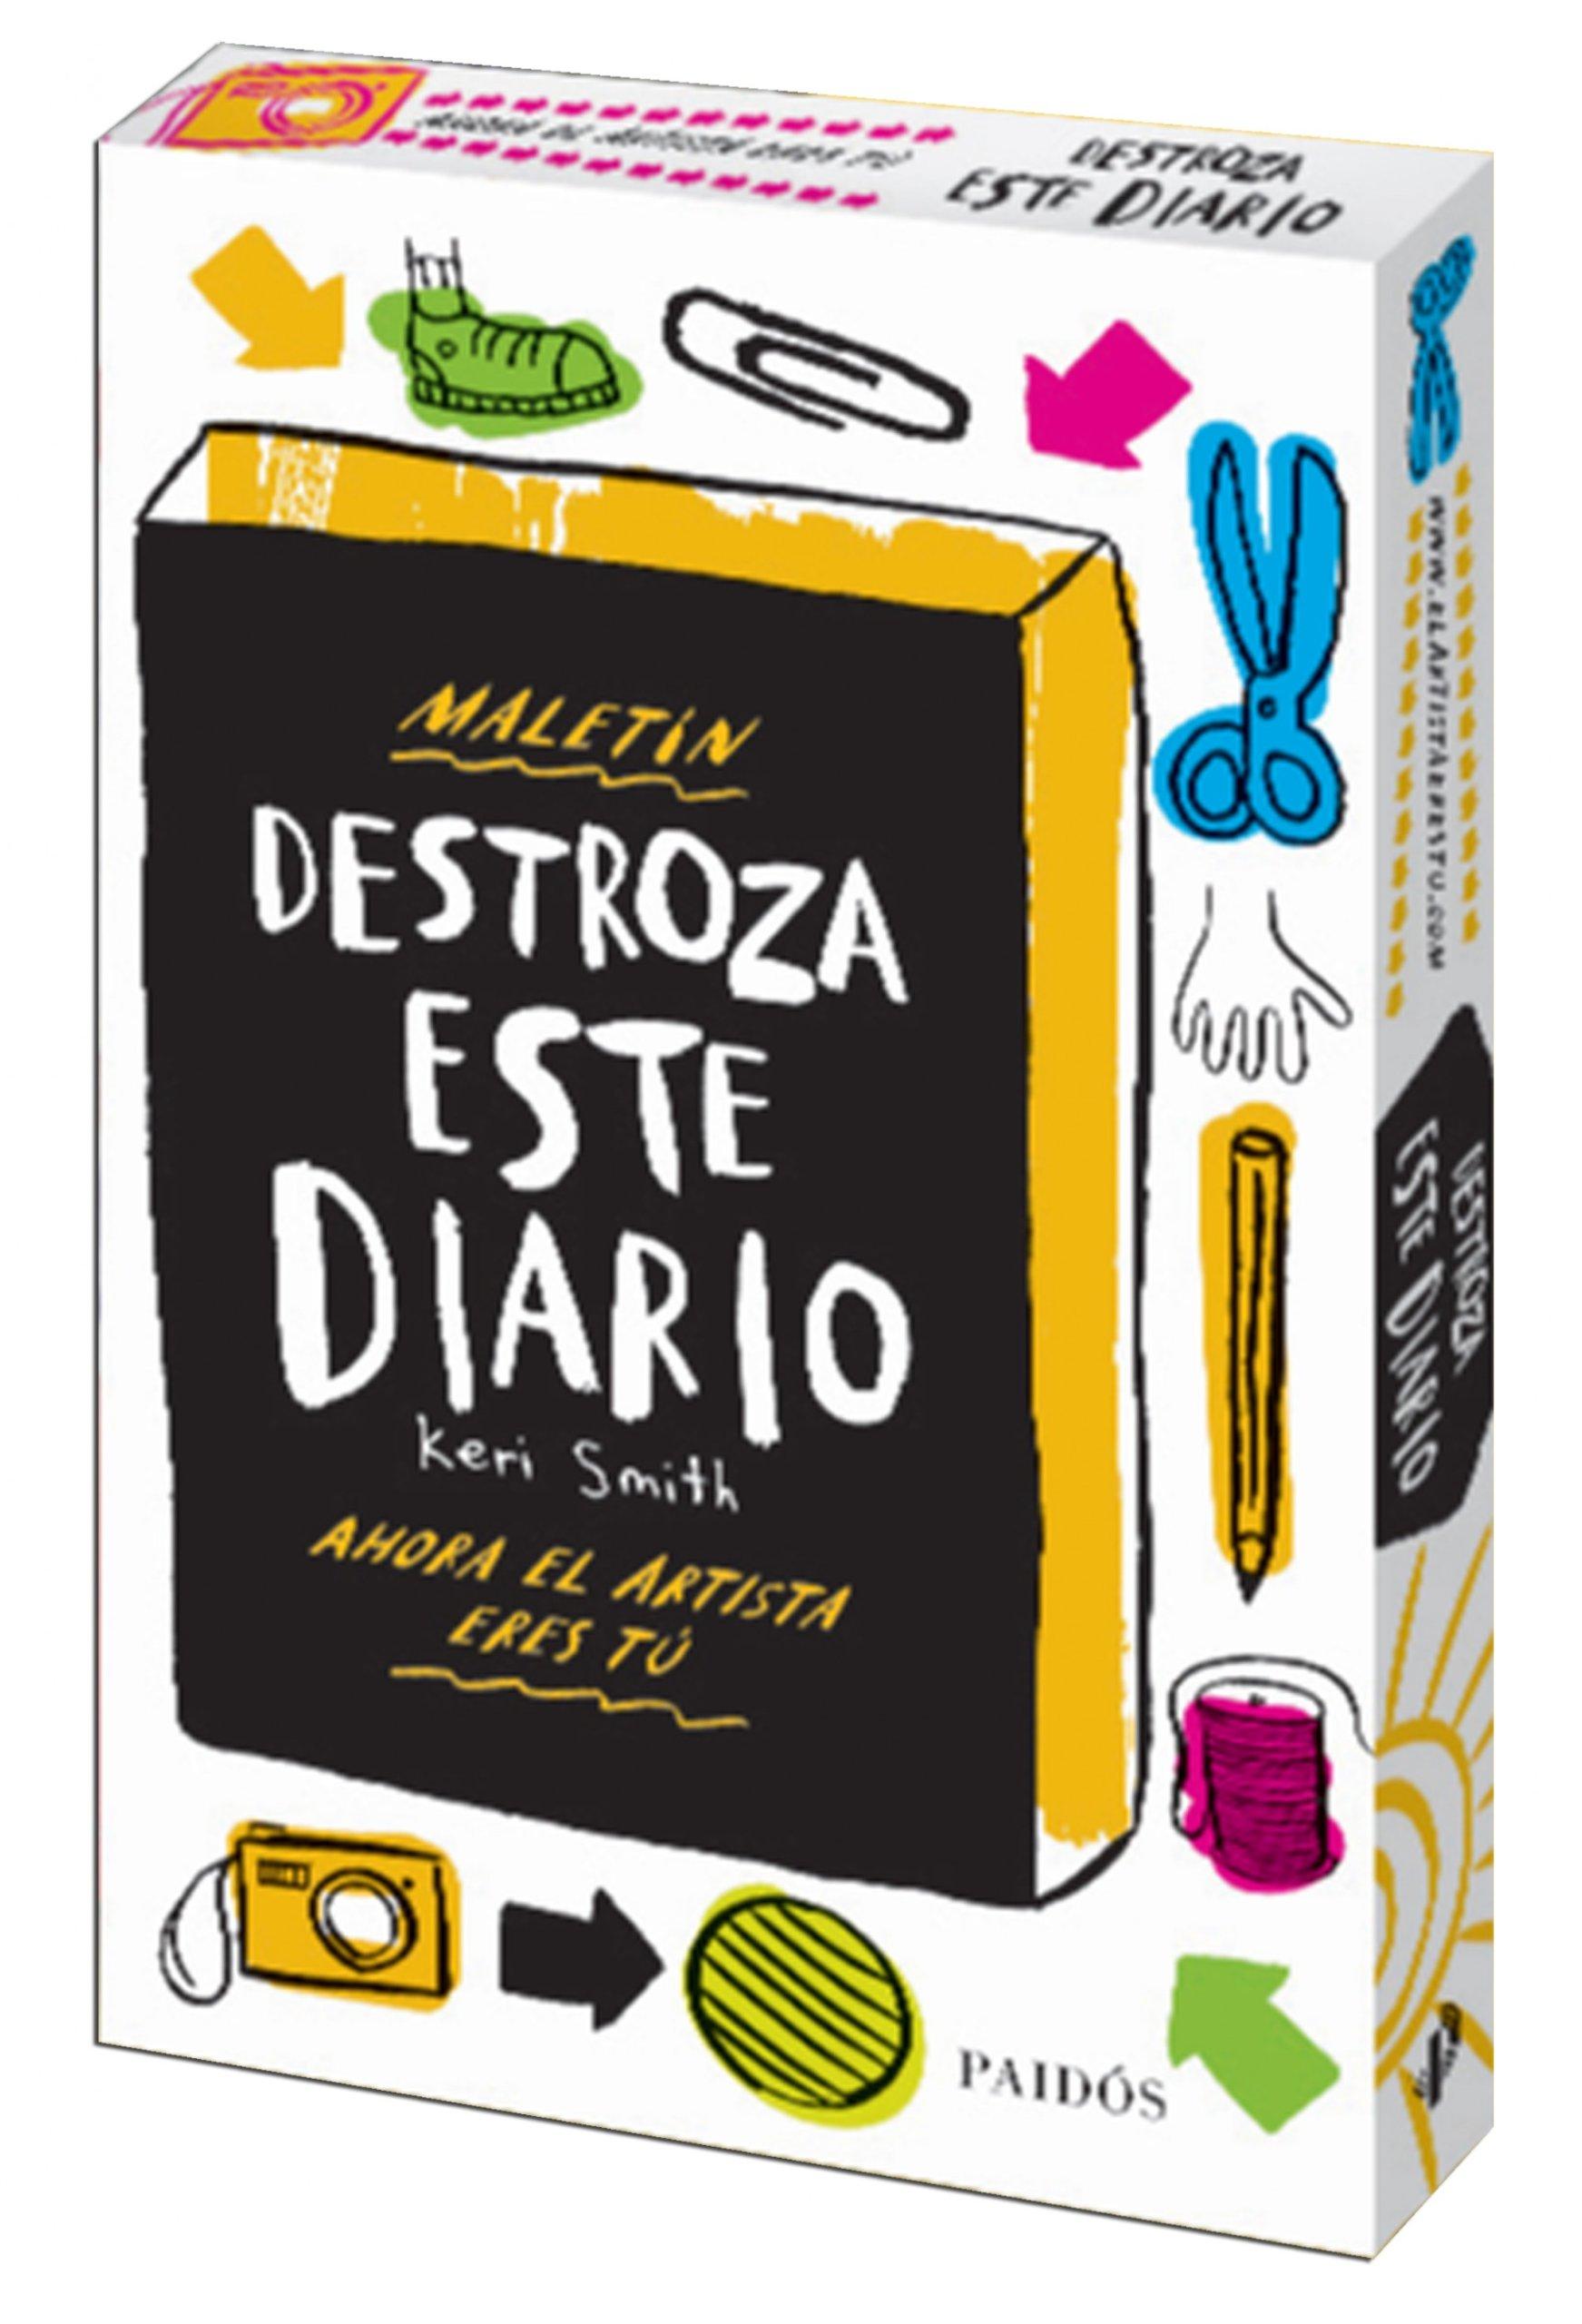 Maletín Destroza este diario (Libros Singulares): Amazon.es: Smith, Keri: Libros